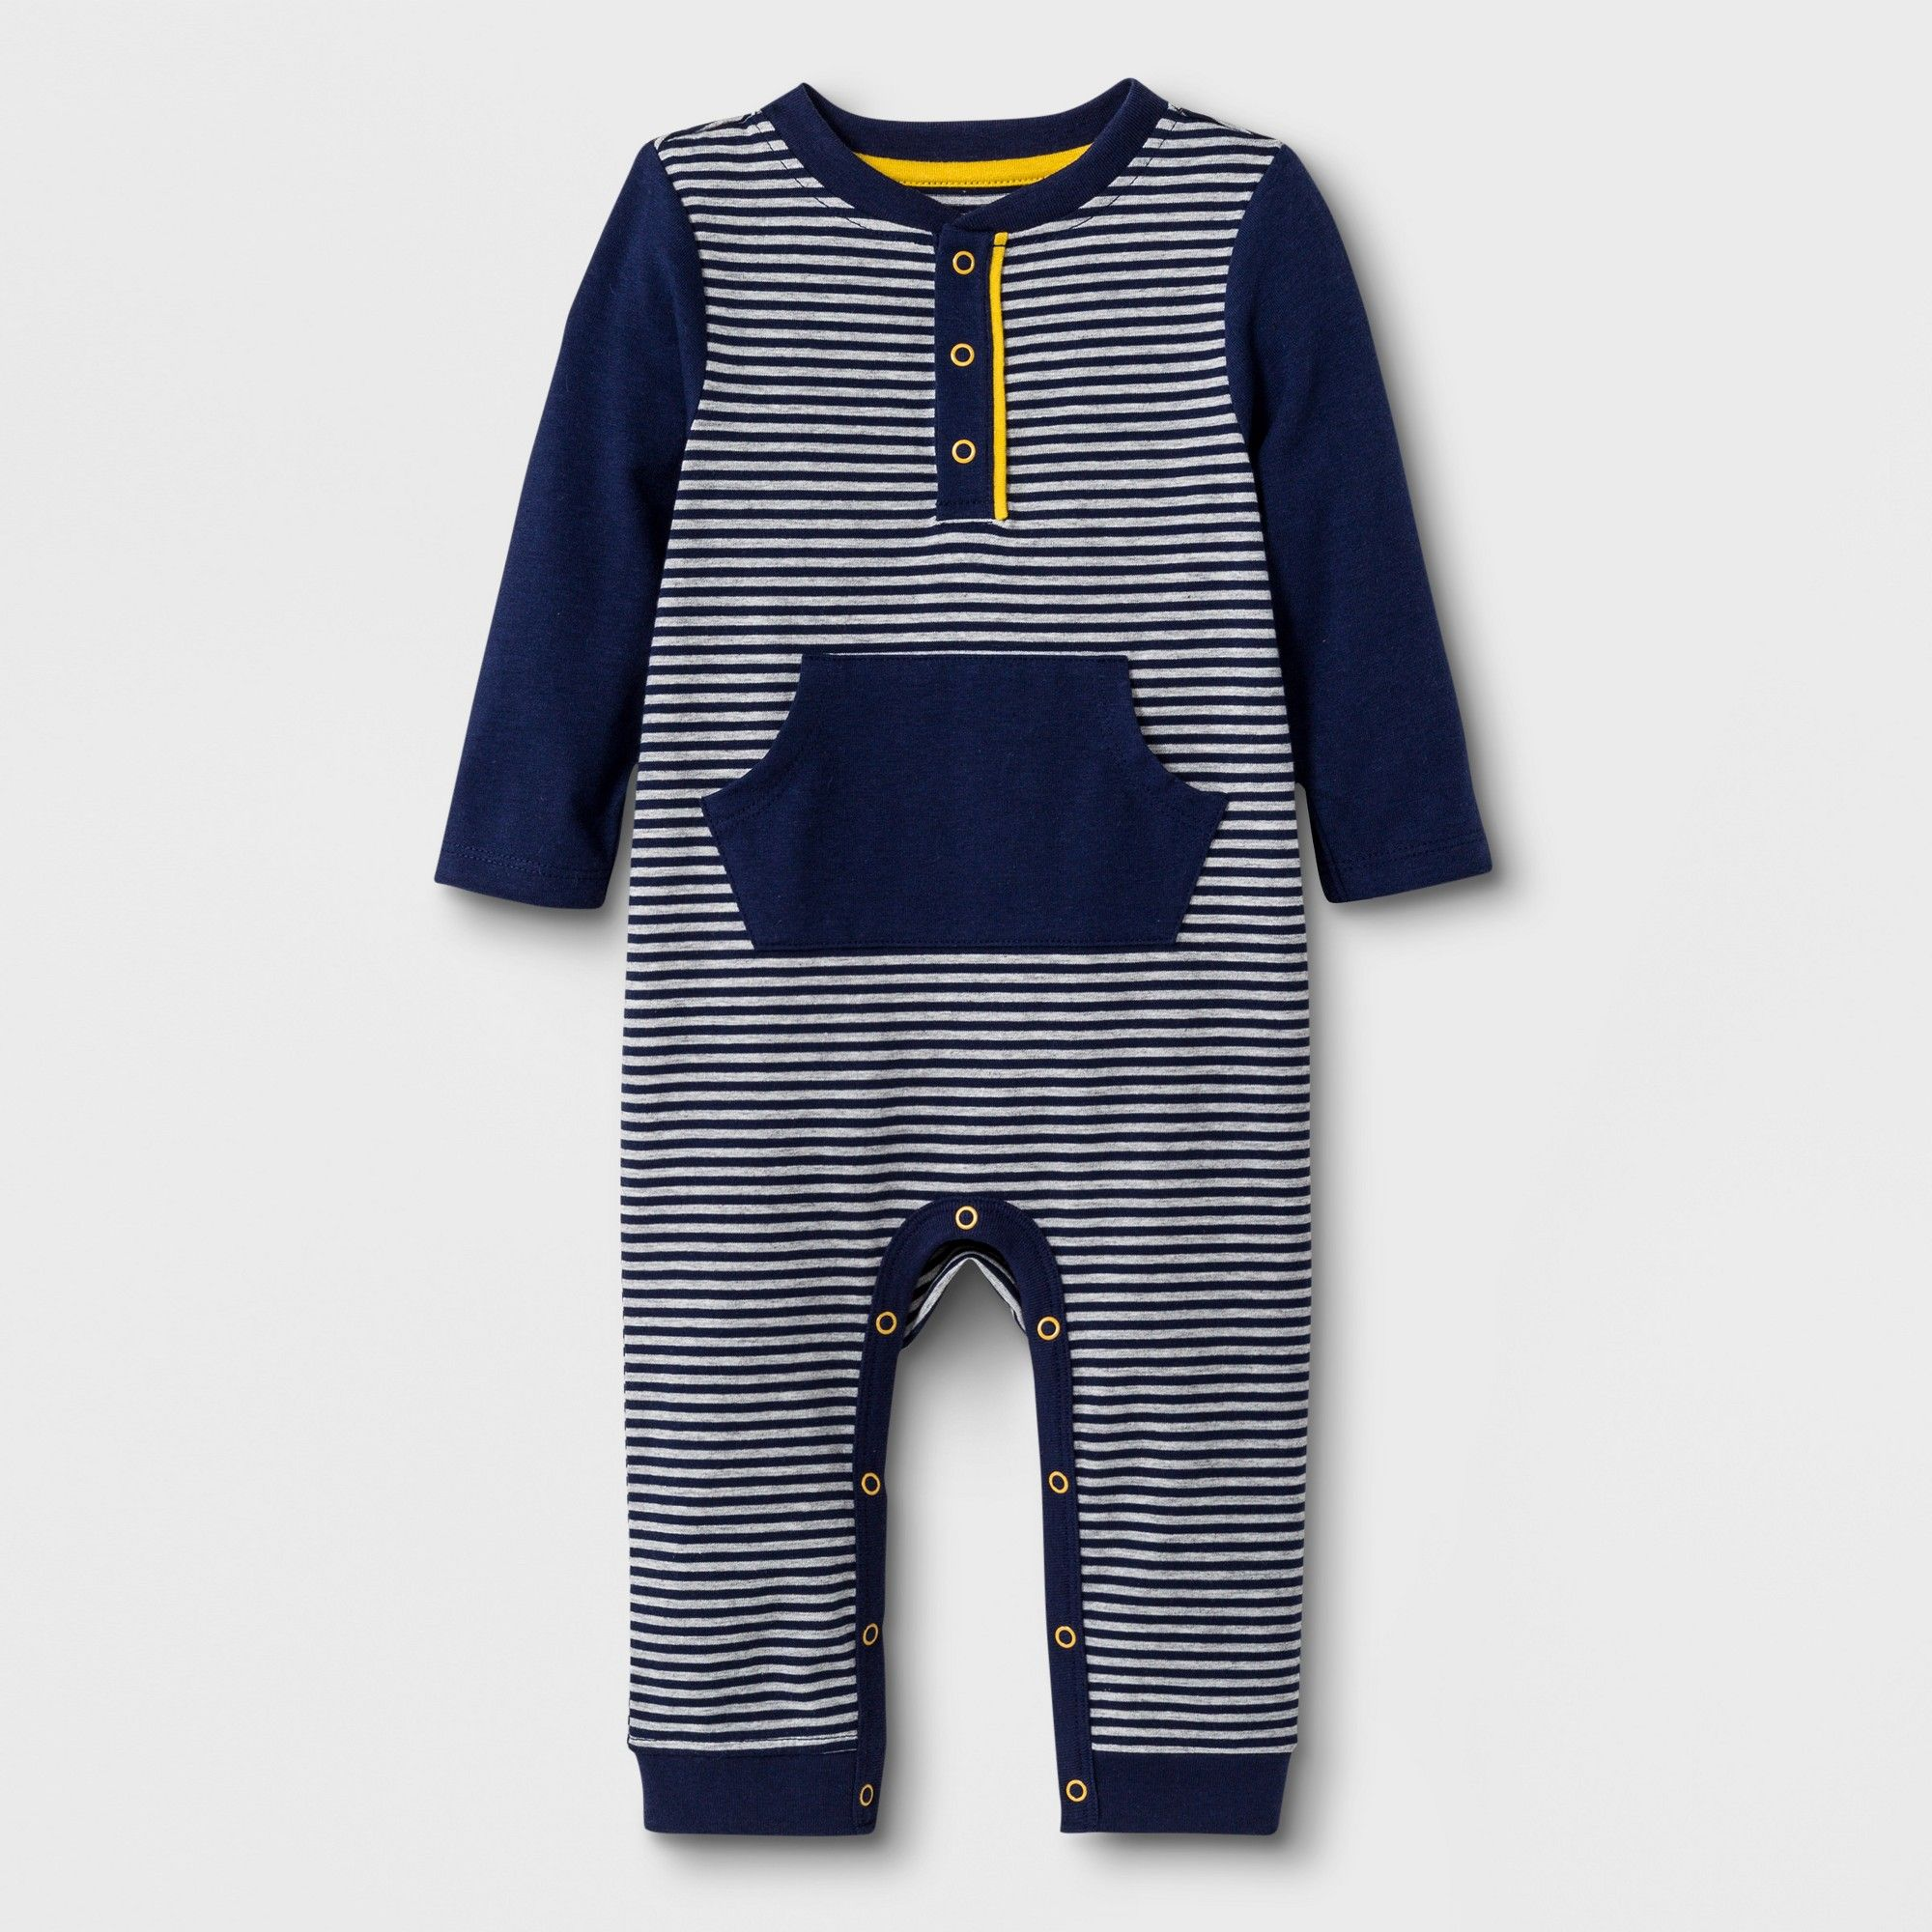 8aa28a5d8607 Baby Boys  Long Sleeve Mini Stripe Heley Romper - Cat   Jack Navy 0 ...